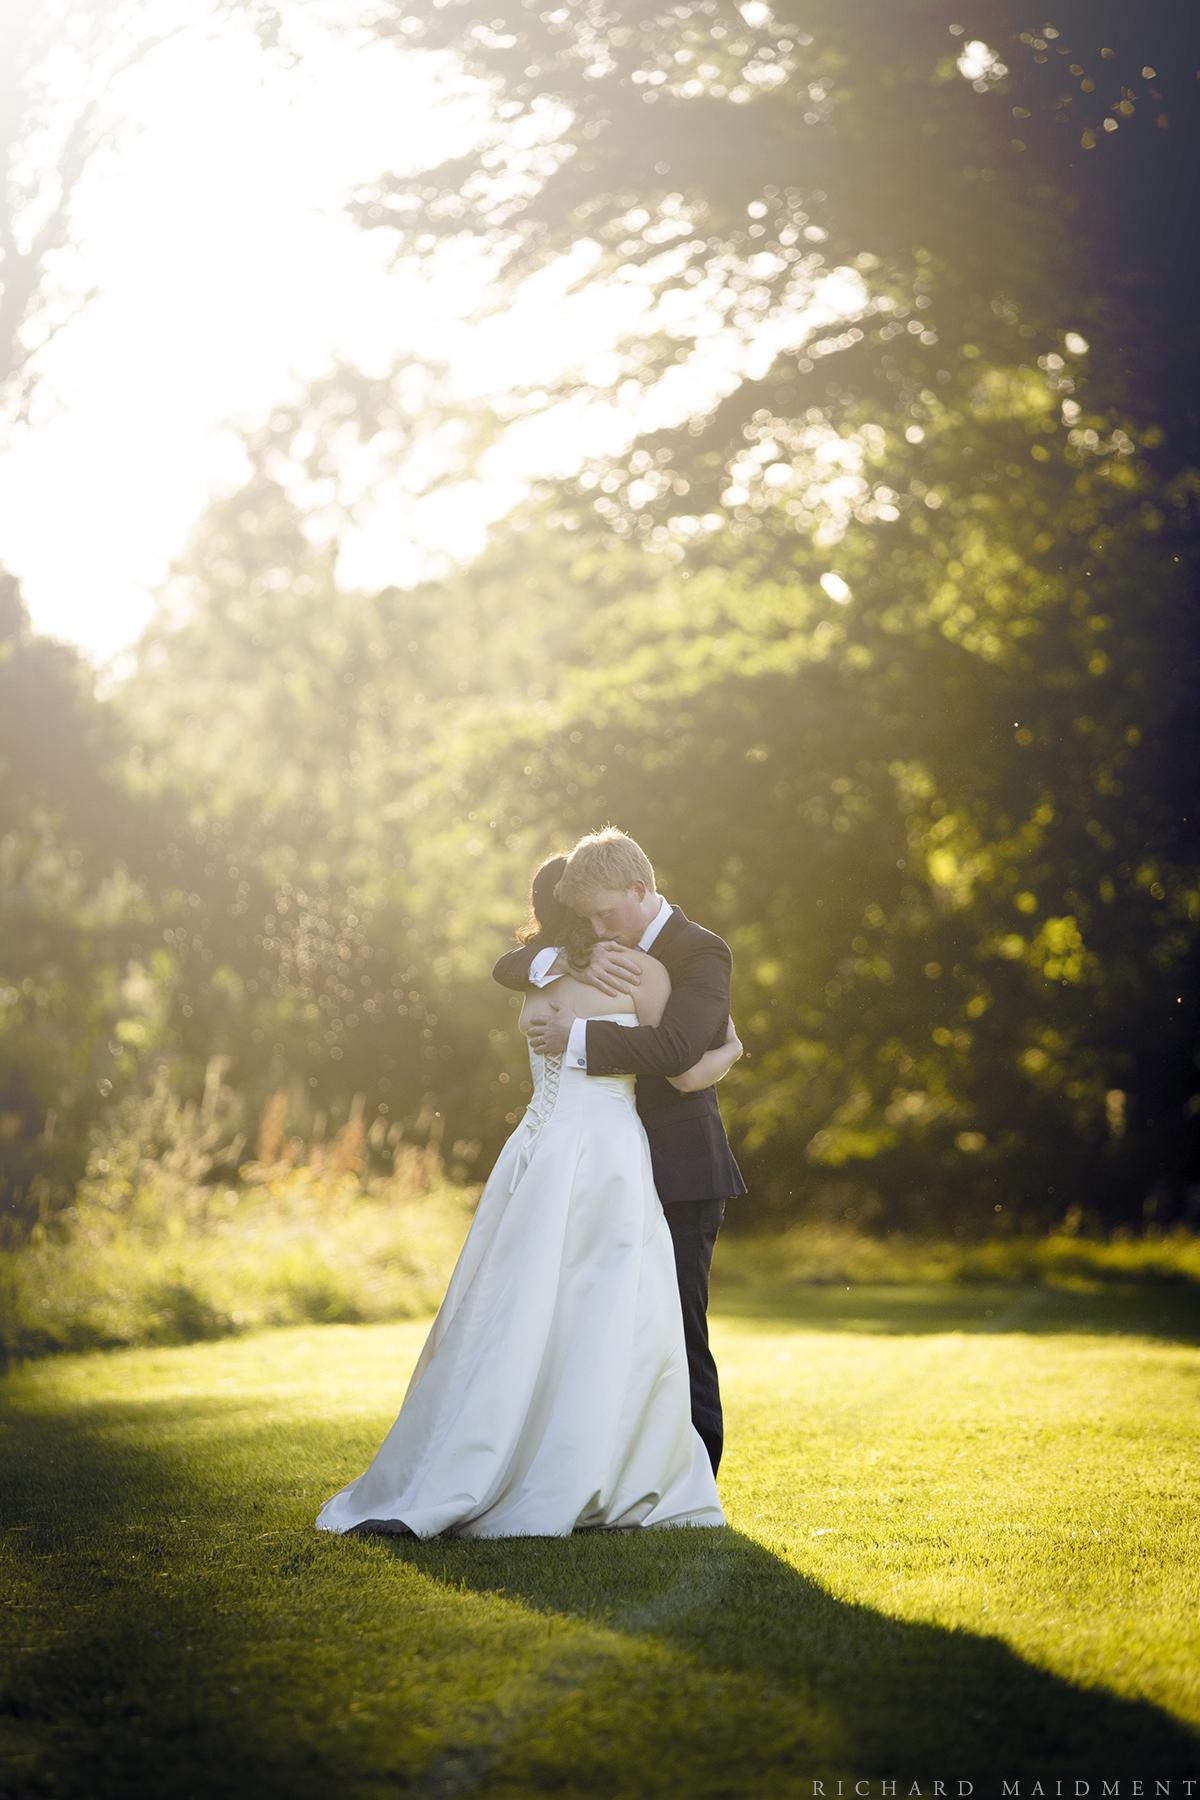 Richard Maidment - Wedding Photography (40).jpg